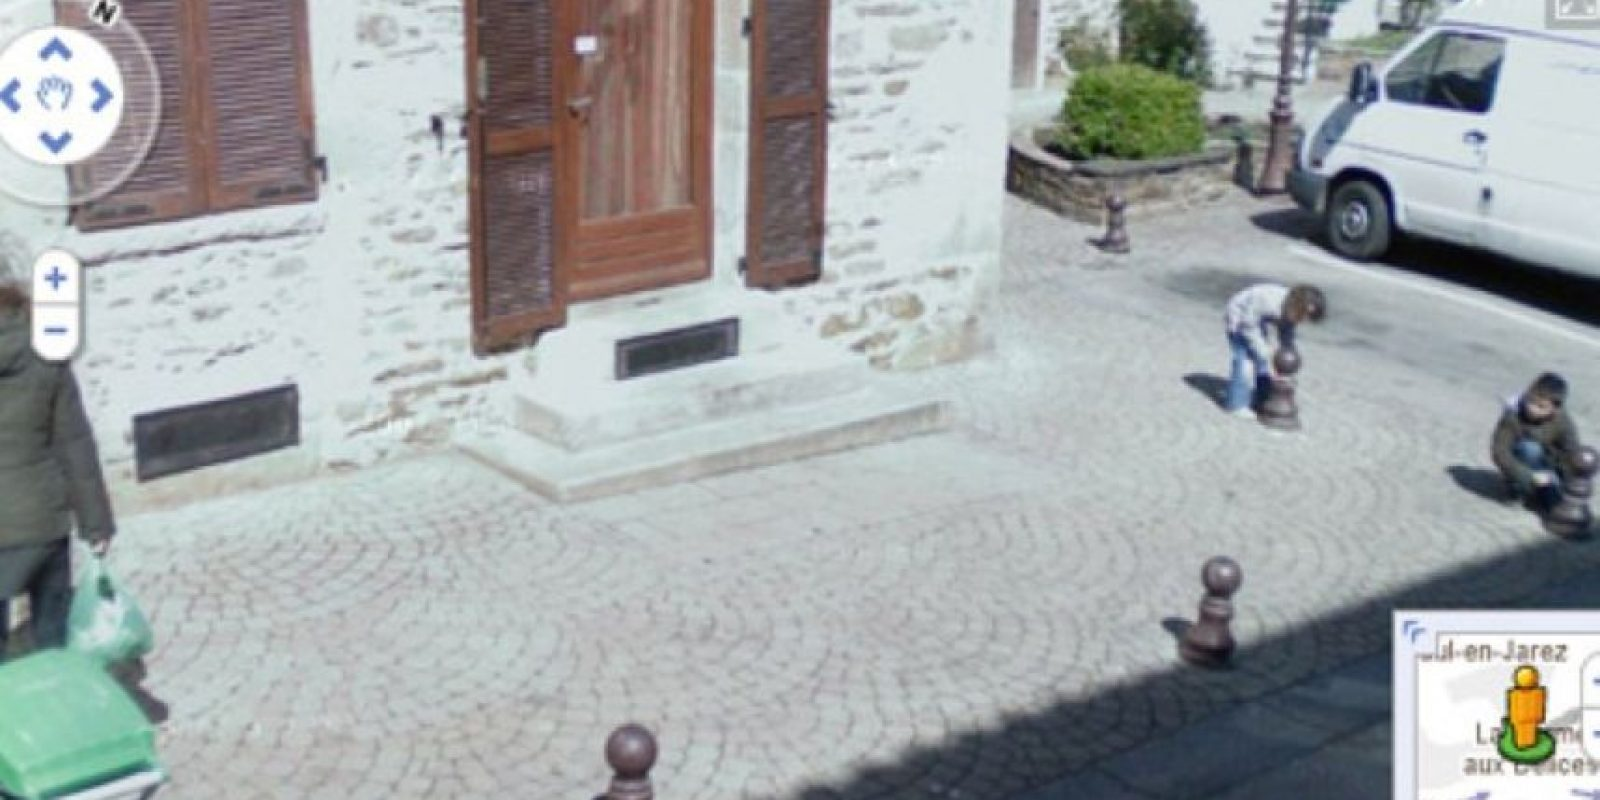 Niños bromistas Foto:Google Street View